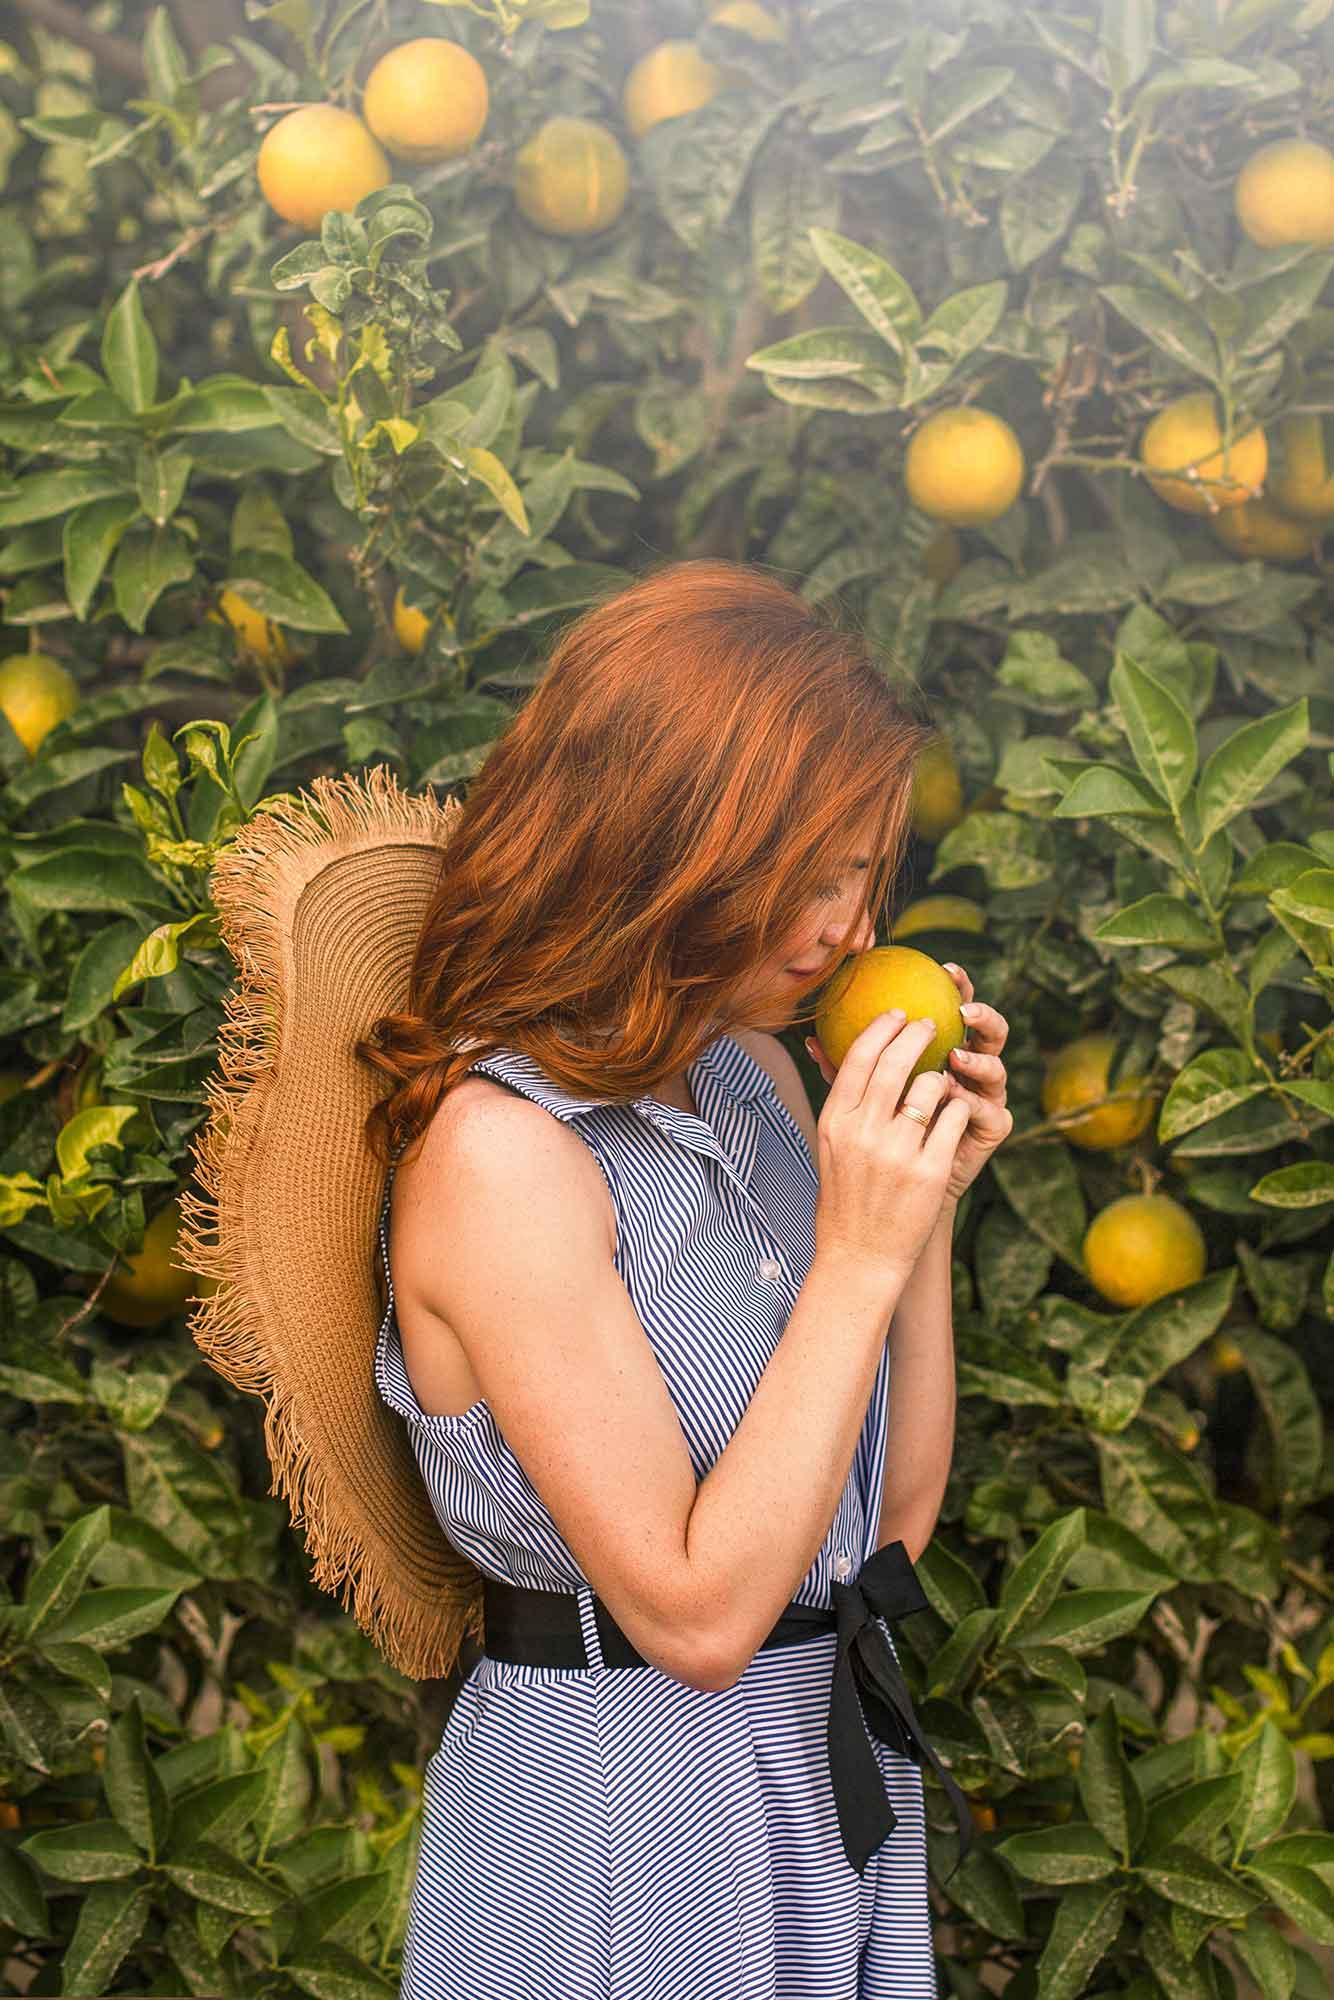 Smelling citrus perfume